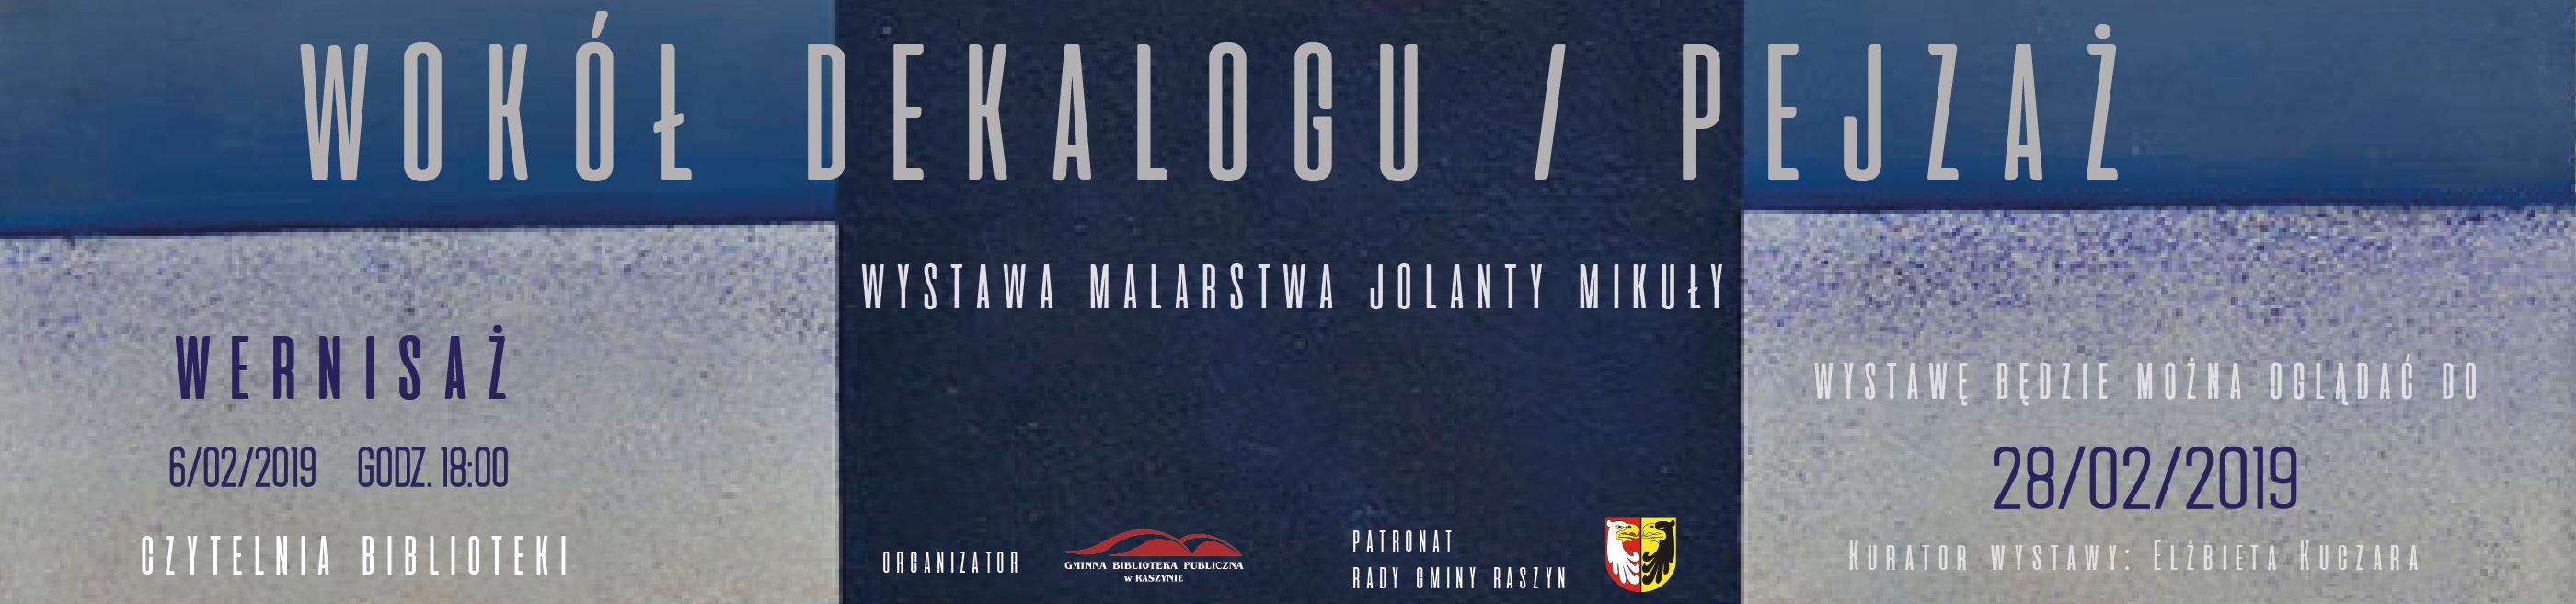 wokol-dekalogu